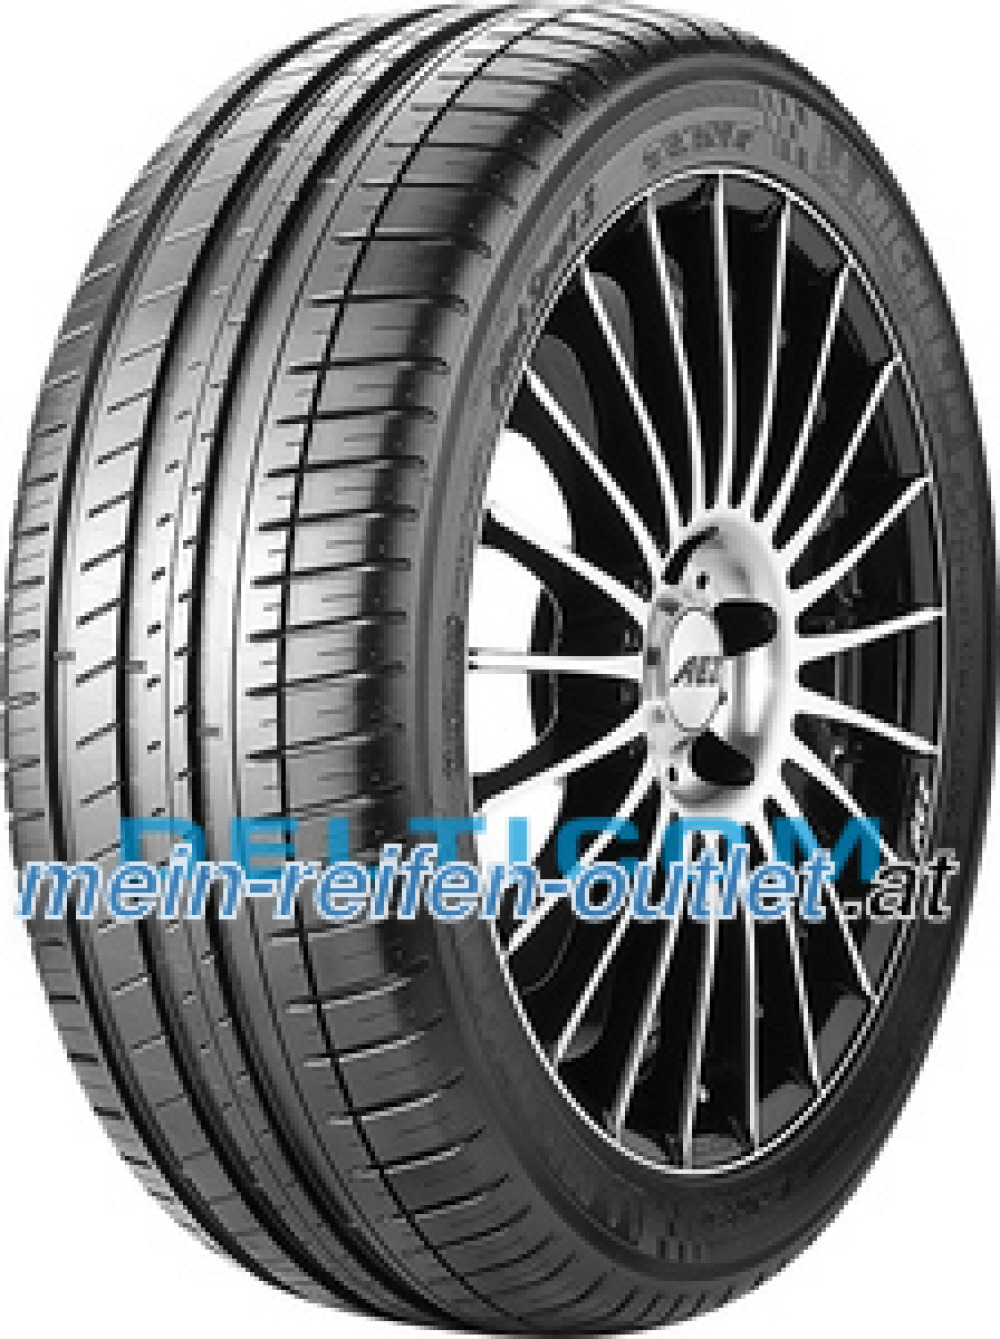 Michelin Pilot Sport 3 ZP ( 245/35 R20 95Y XL runflat, MOE, *, GRNX, mit Felgenschutzleiste (FSL) )